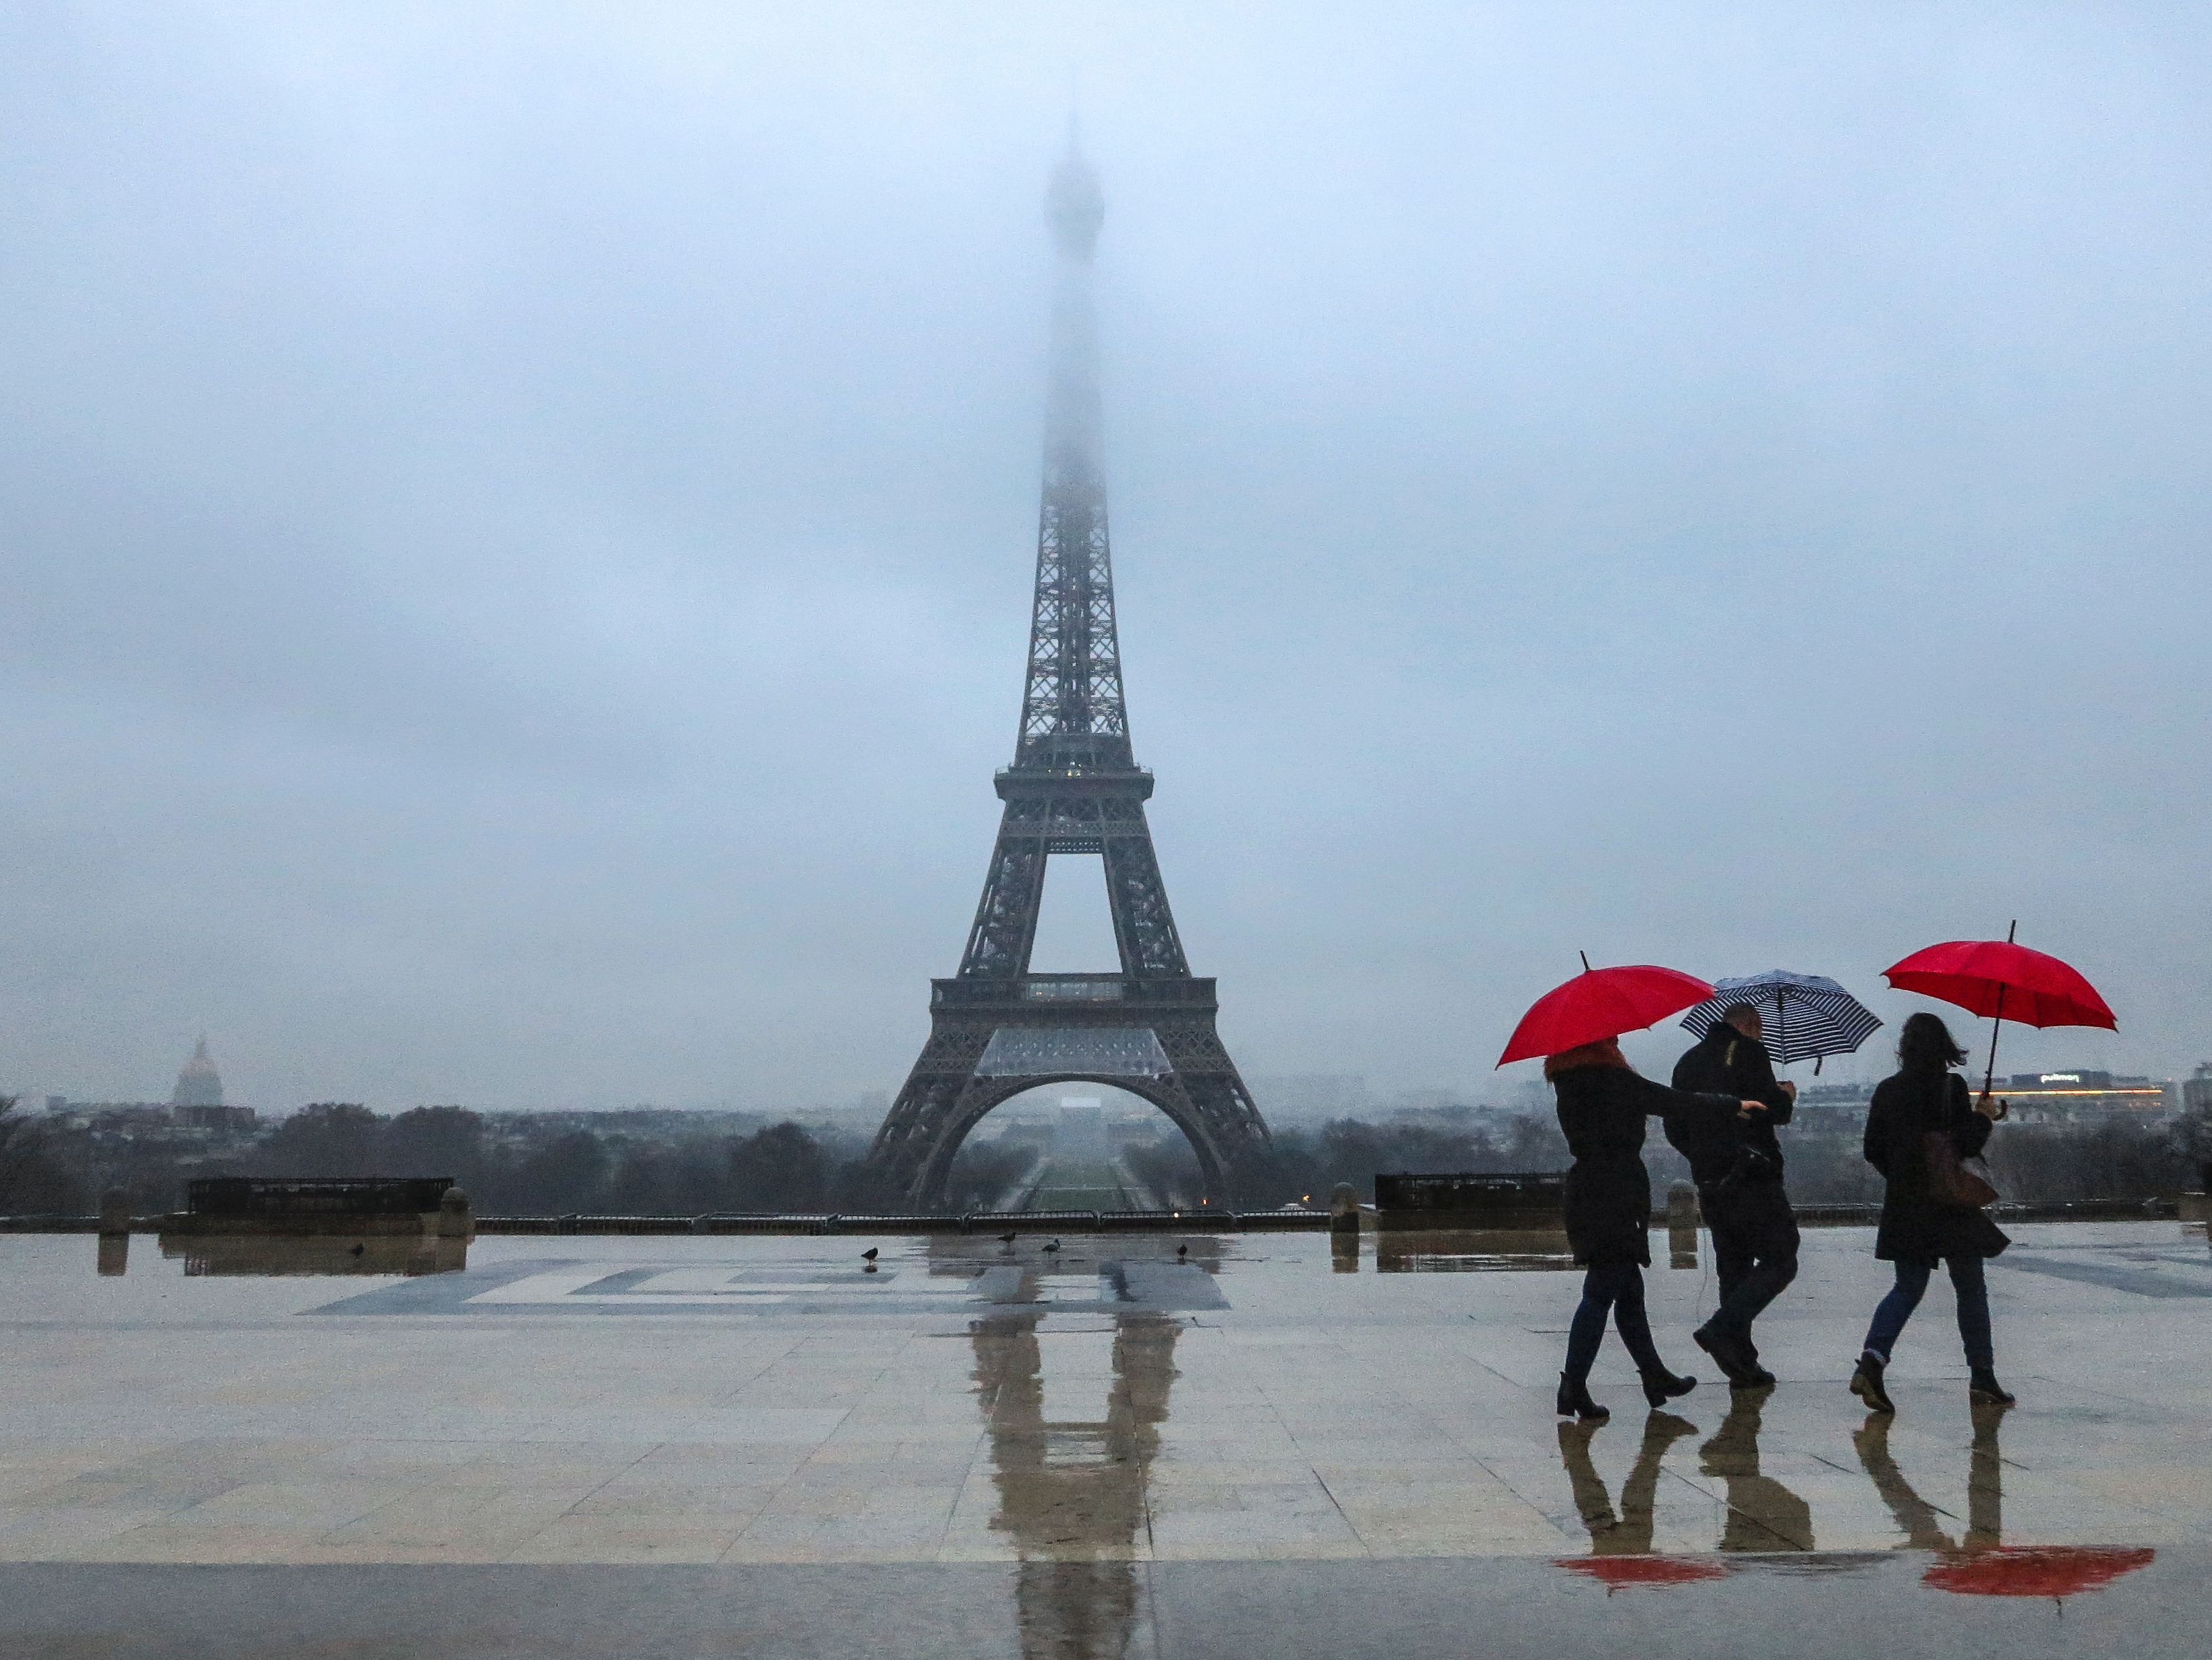 Torre Eiffel vai ter barreira de vidro à prova de bala